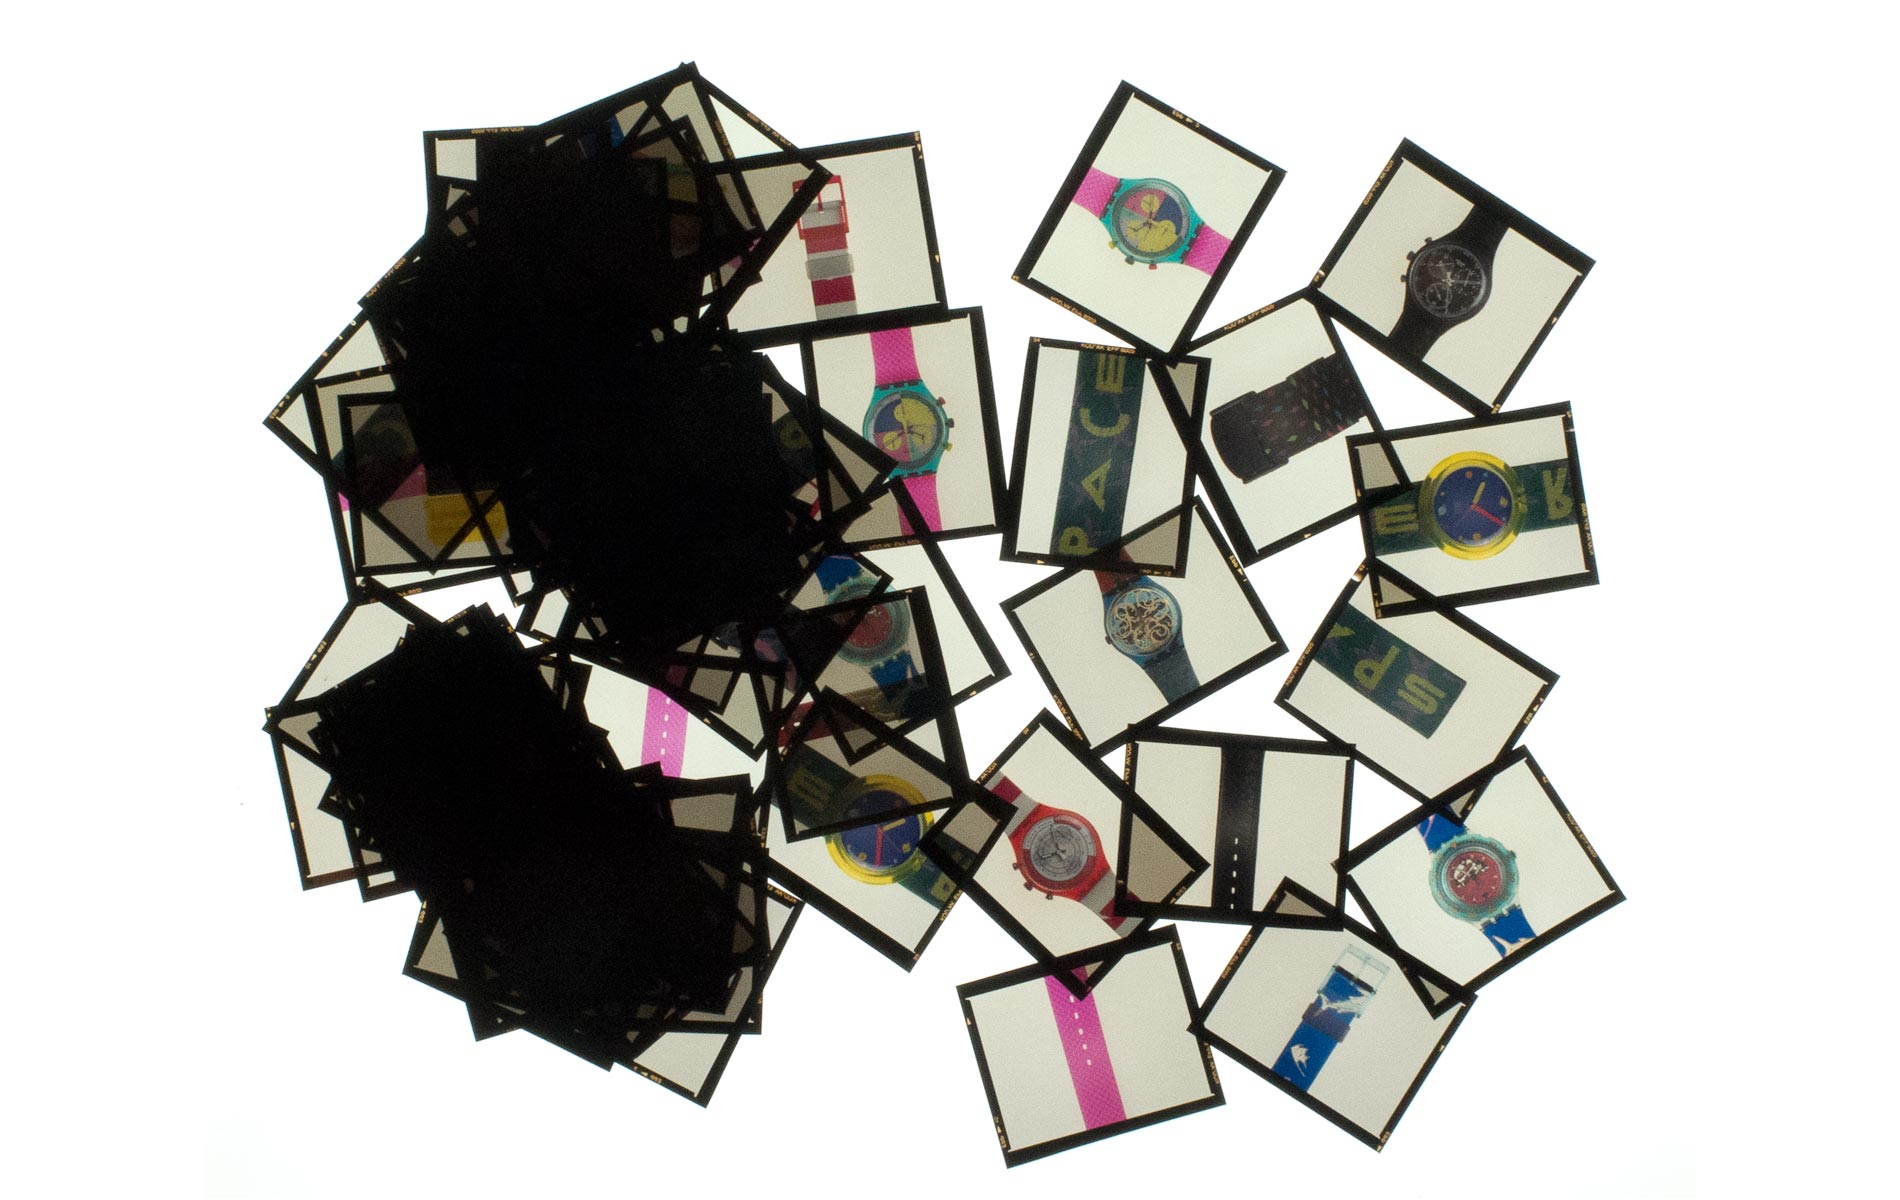 SWATCH PUZZLE Collection - all color slides - 120 size - © Graziano Villa